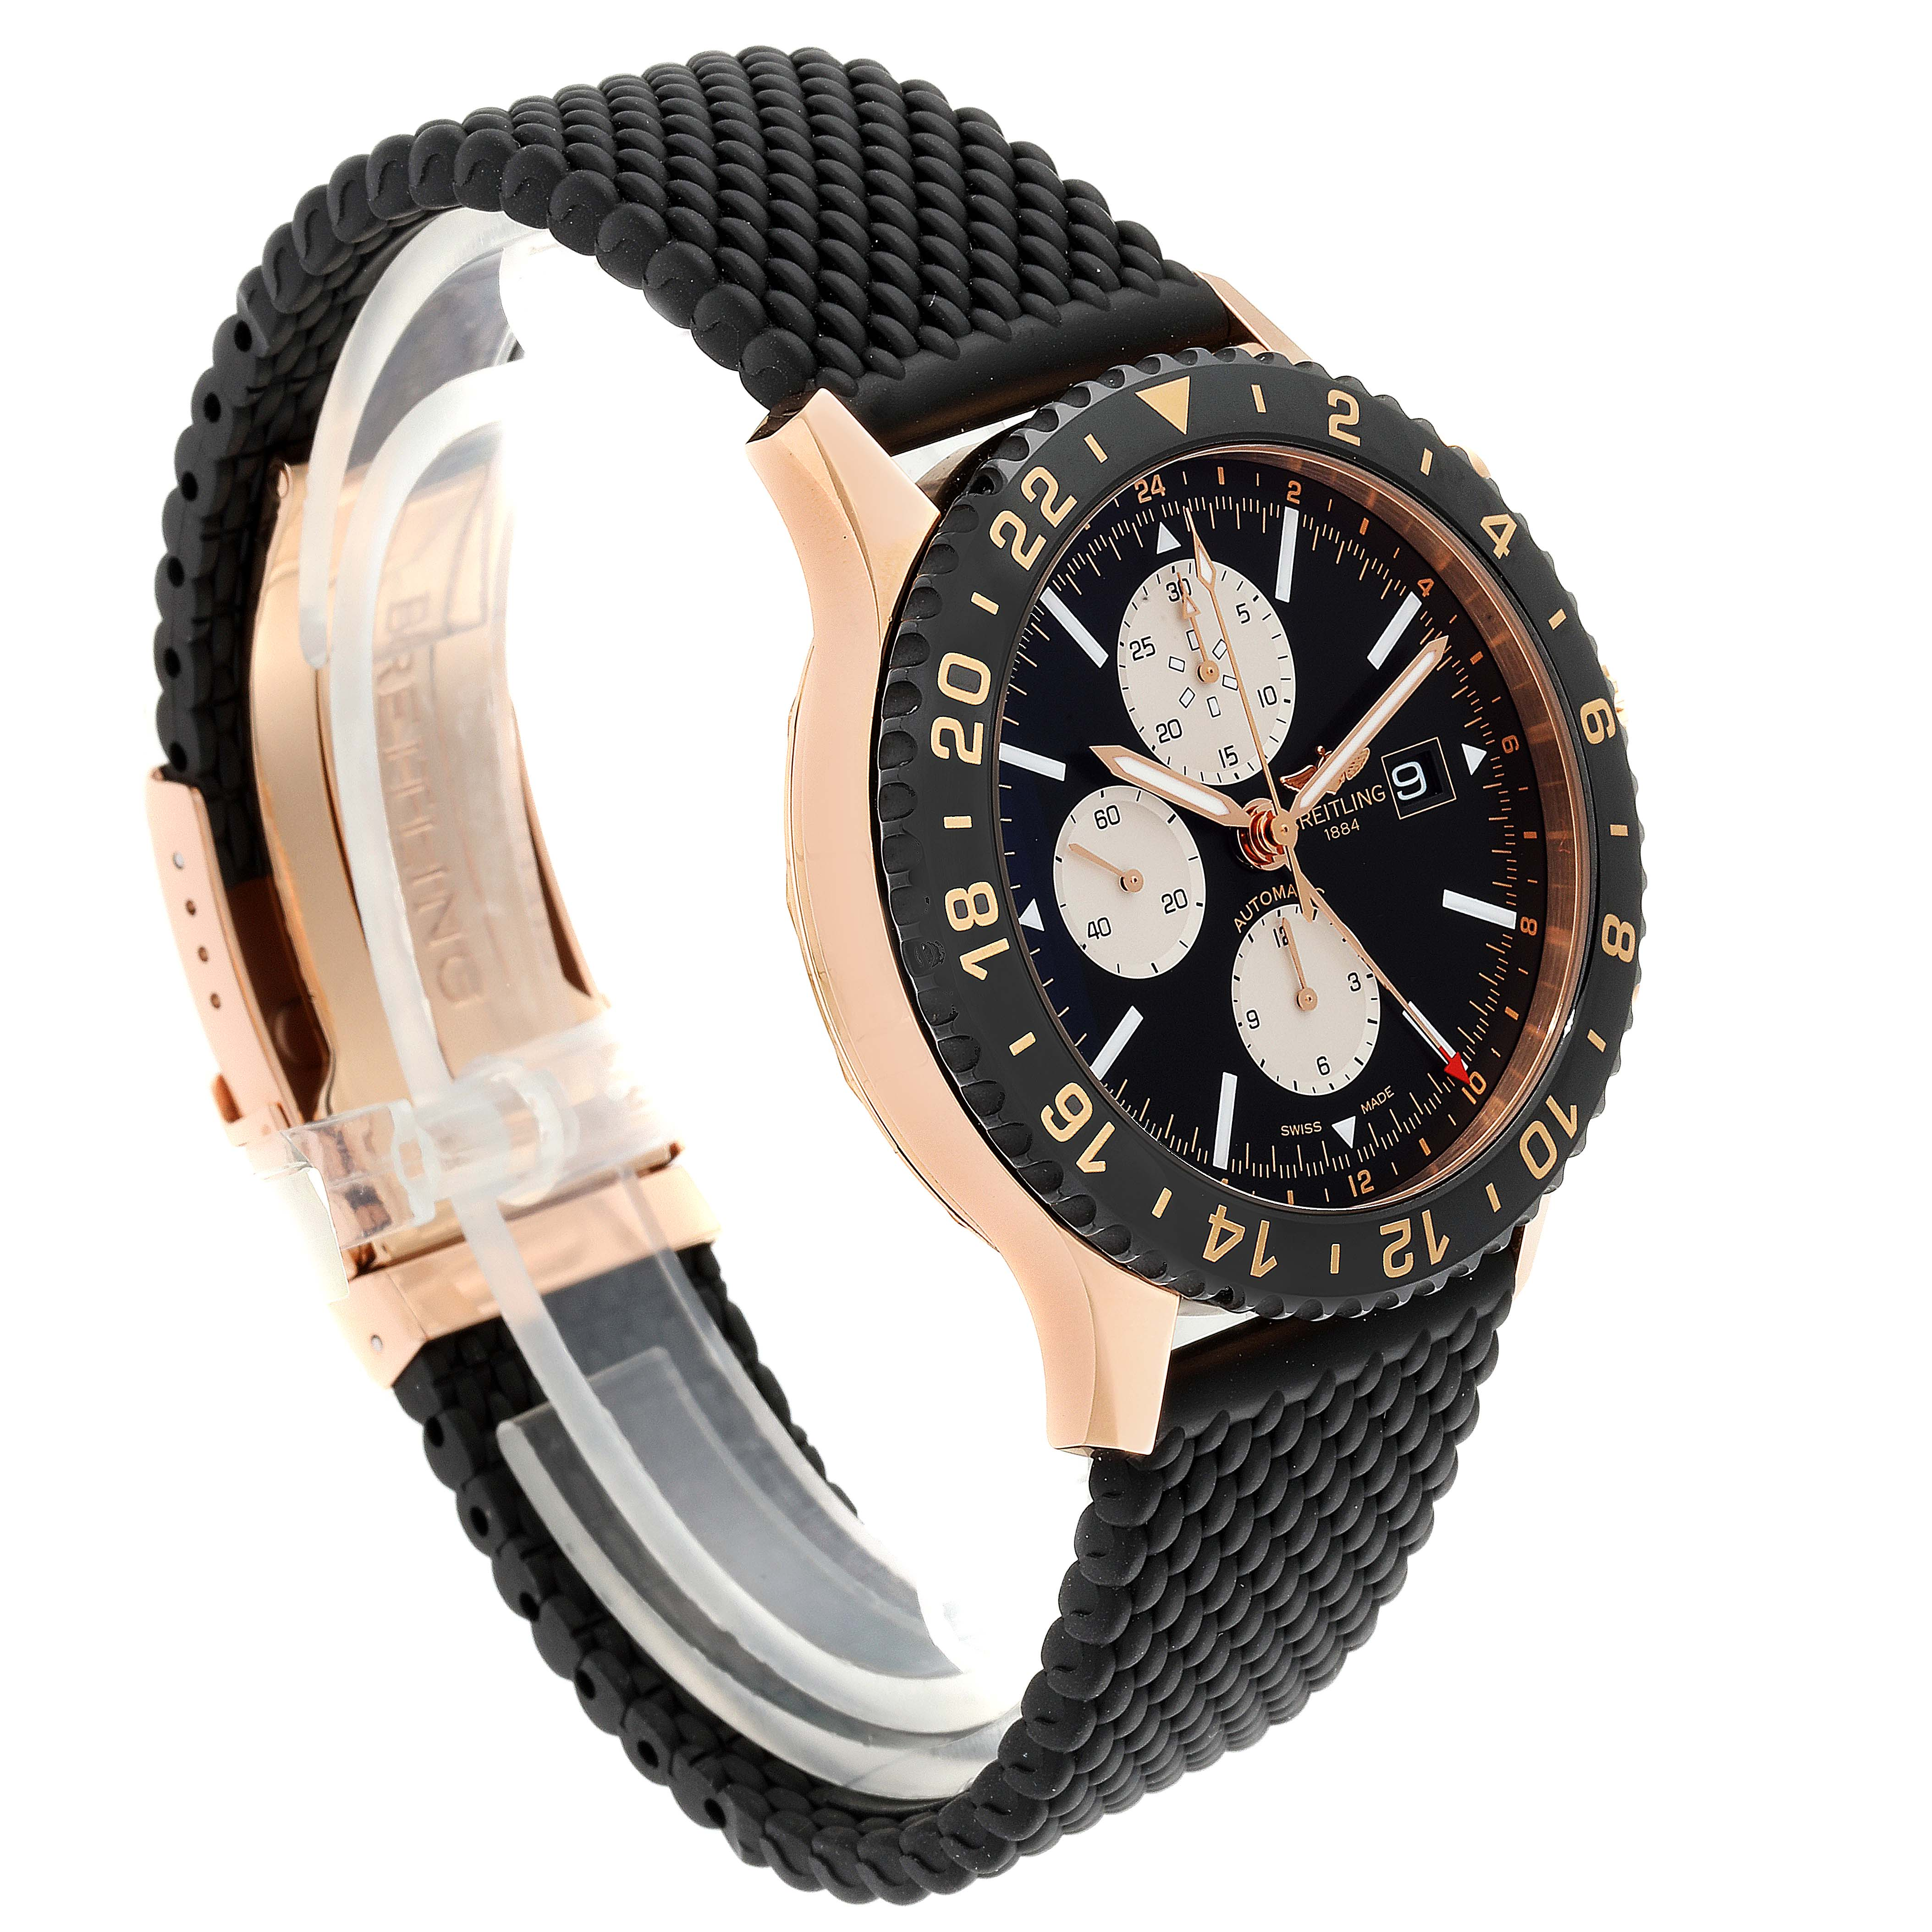 Breitling Chronoliner Limited Red Gold Mens Watch R24312 Unworn SwissWatchExpo